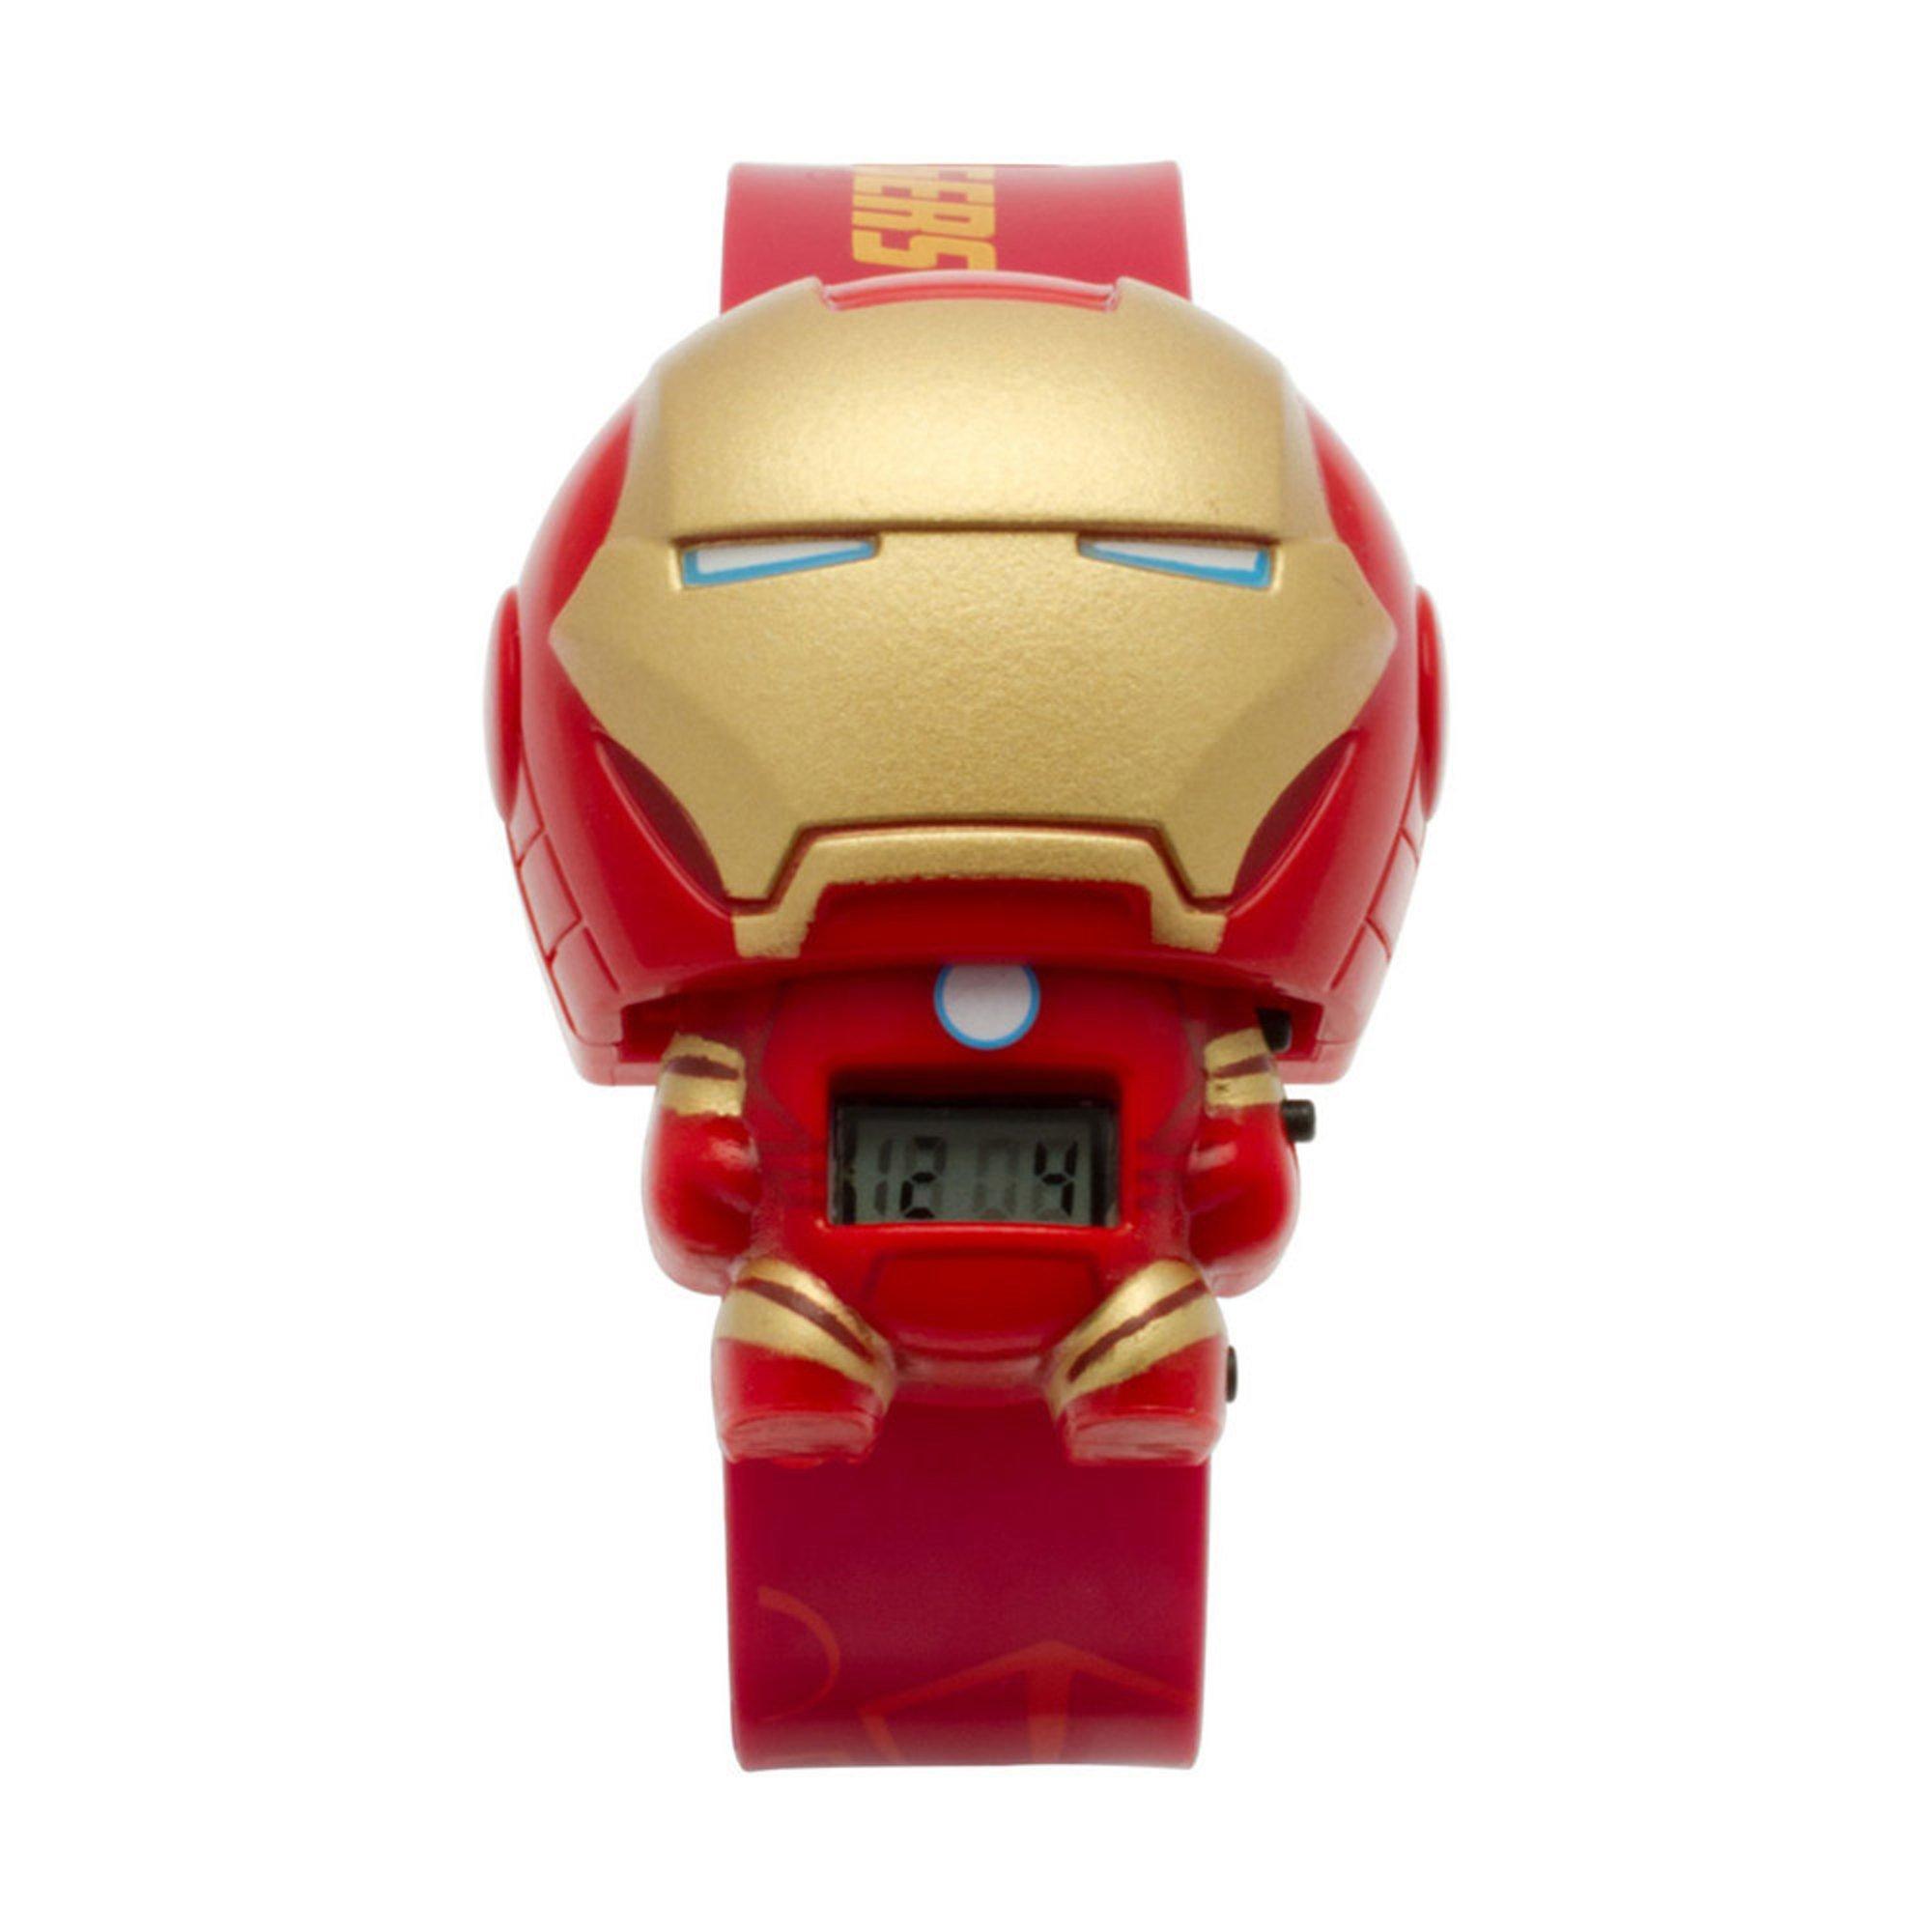 Timex Ironman Watches | REI Co-op